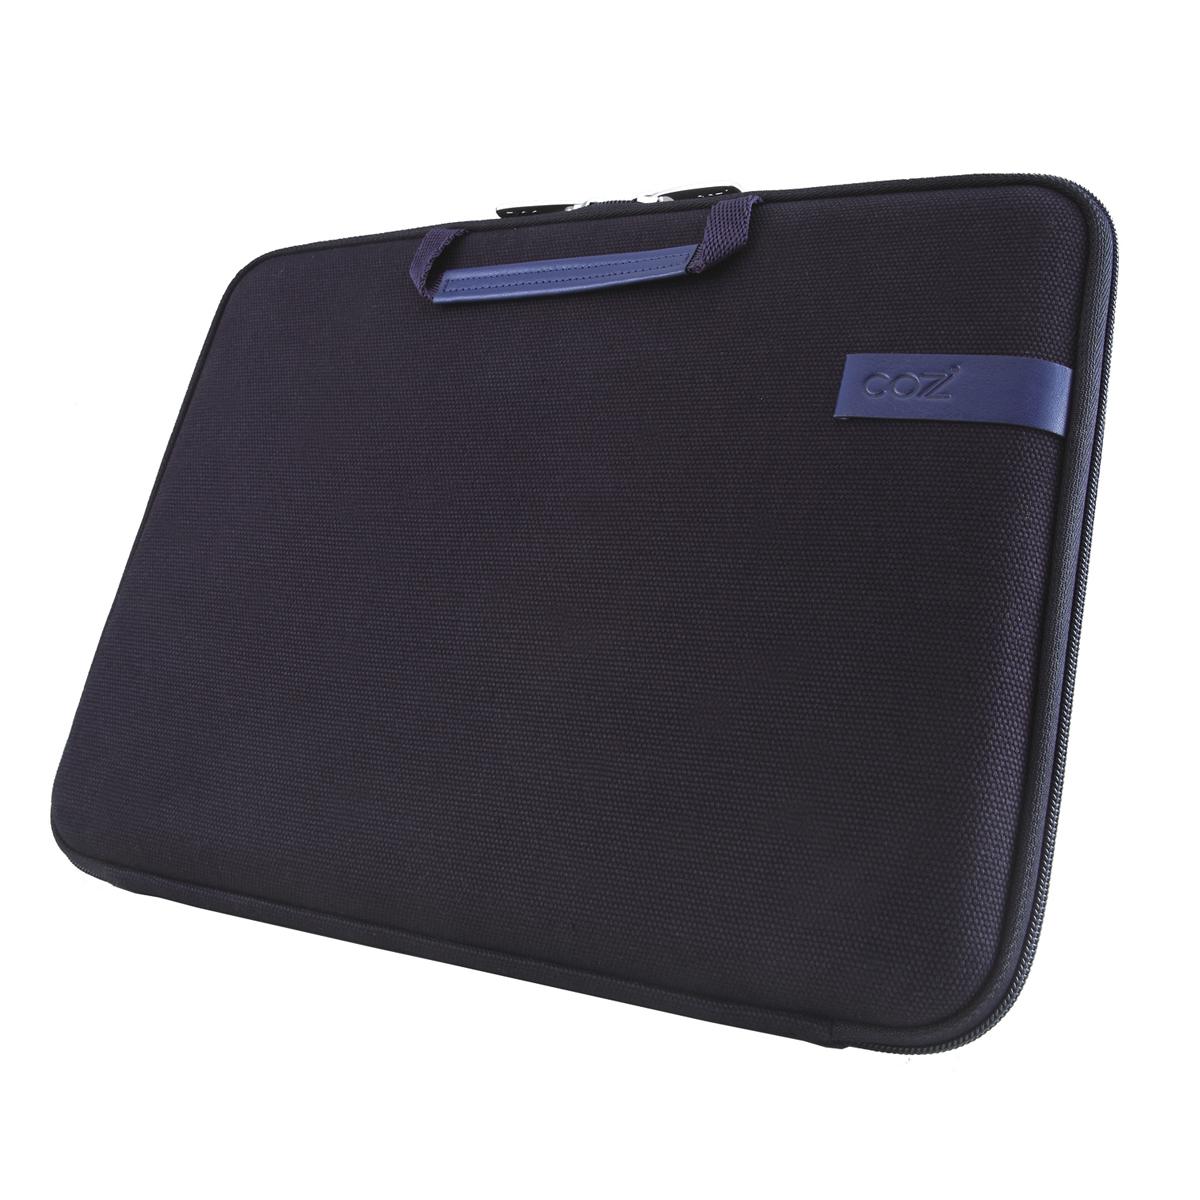 Cozistyle SmartSleeve for 15.4吋 MacBook Pro (Retina) 智能散熱防潑水手提硬殼電腦保護套 - 帆布沉靜藍